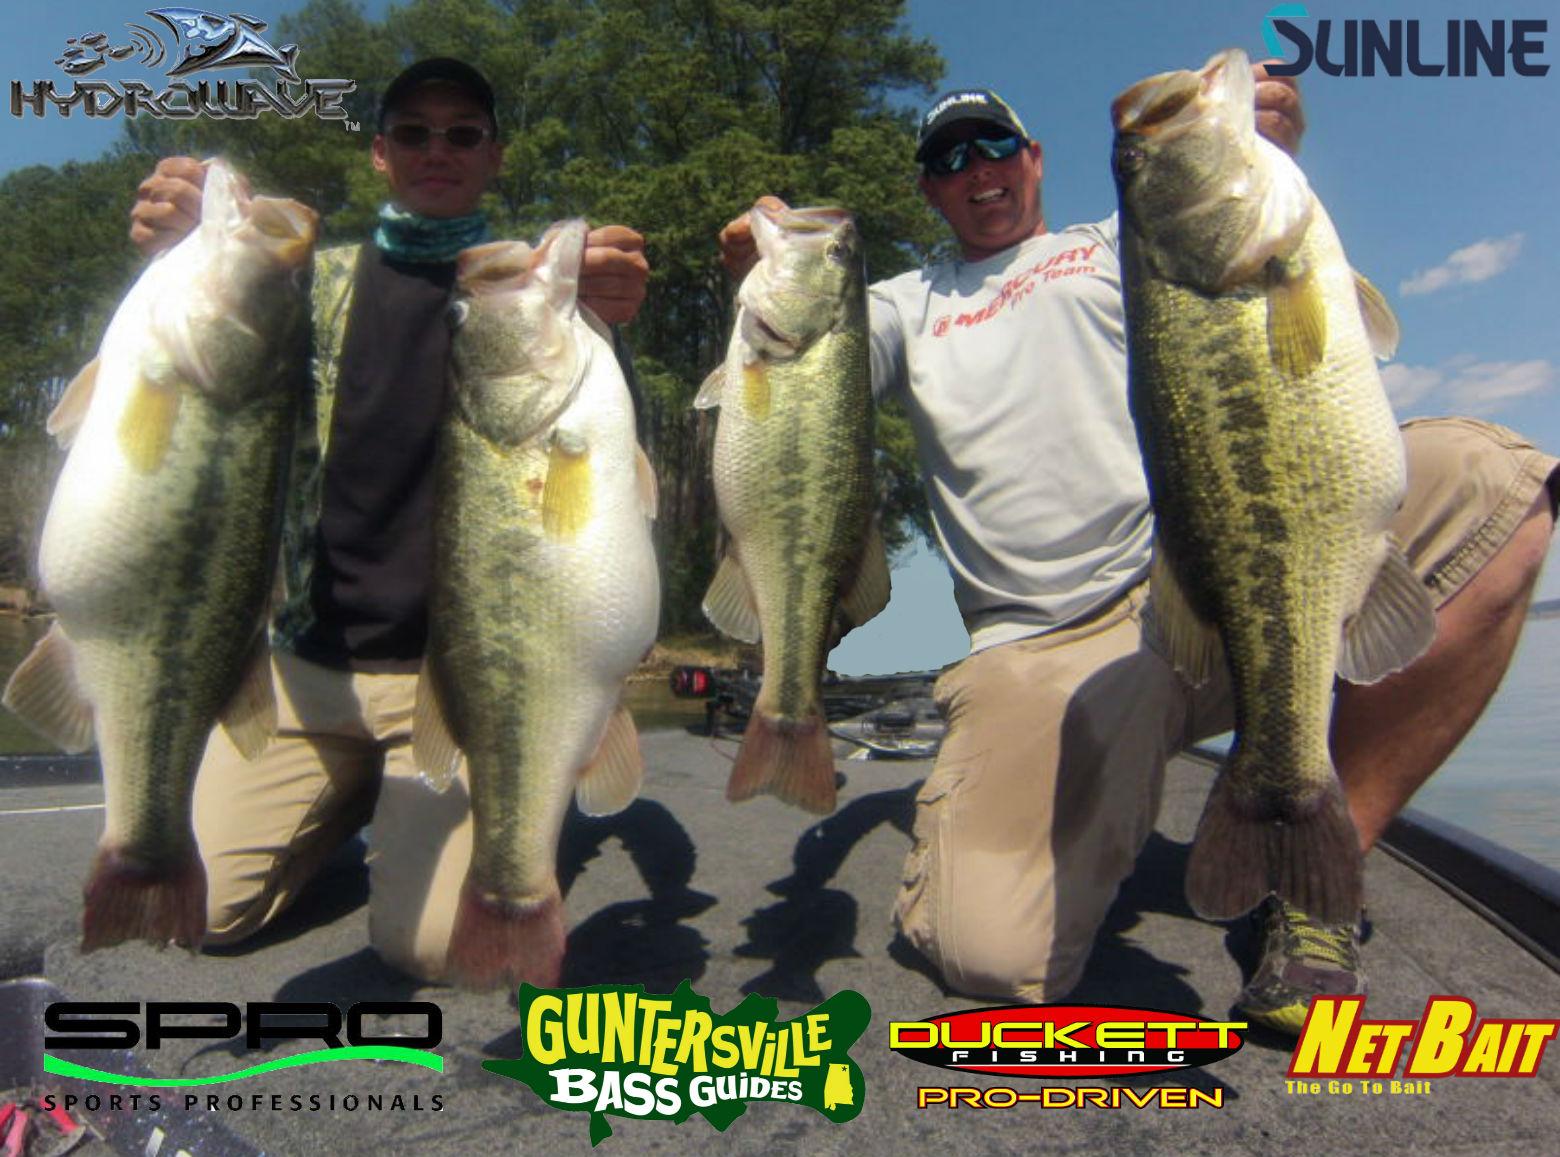 lake guntersville fishing report Guntersville Bass Guides: Lake Guntersville Bass Fishing Report ...